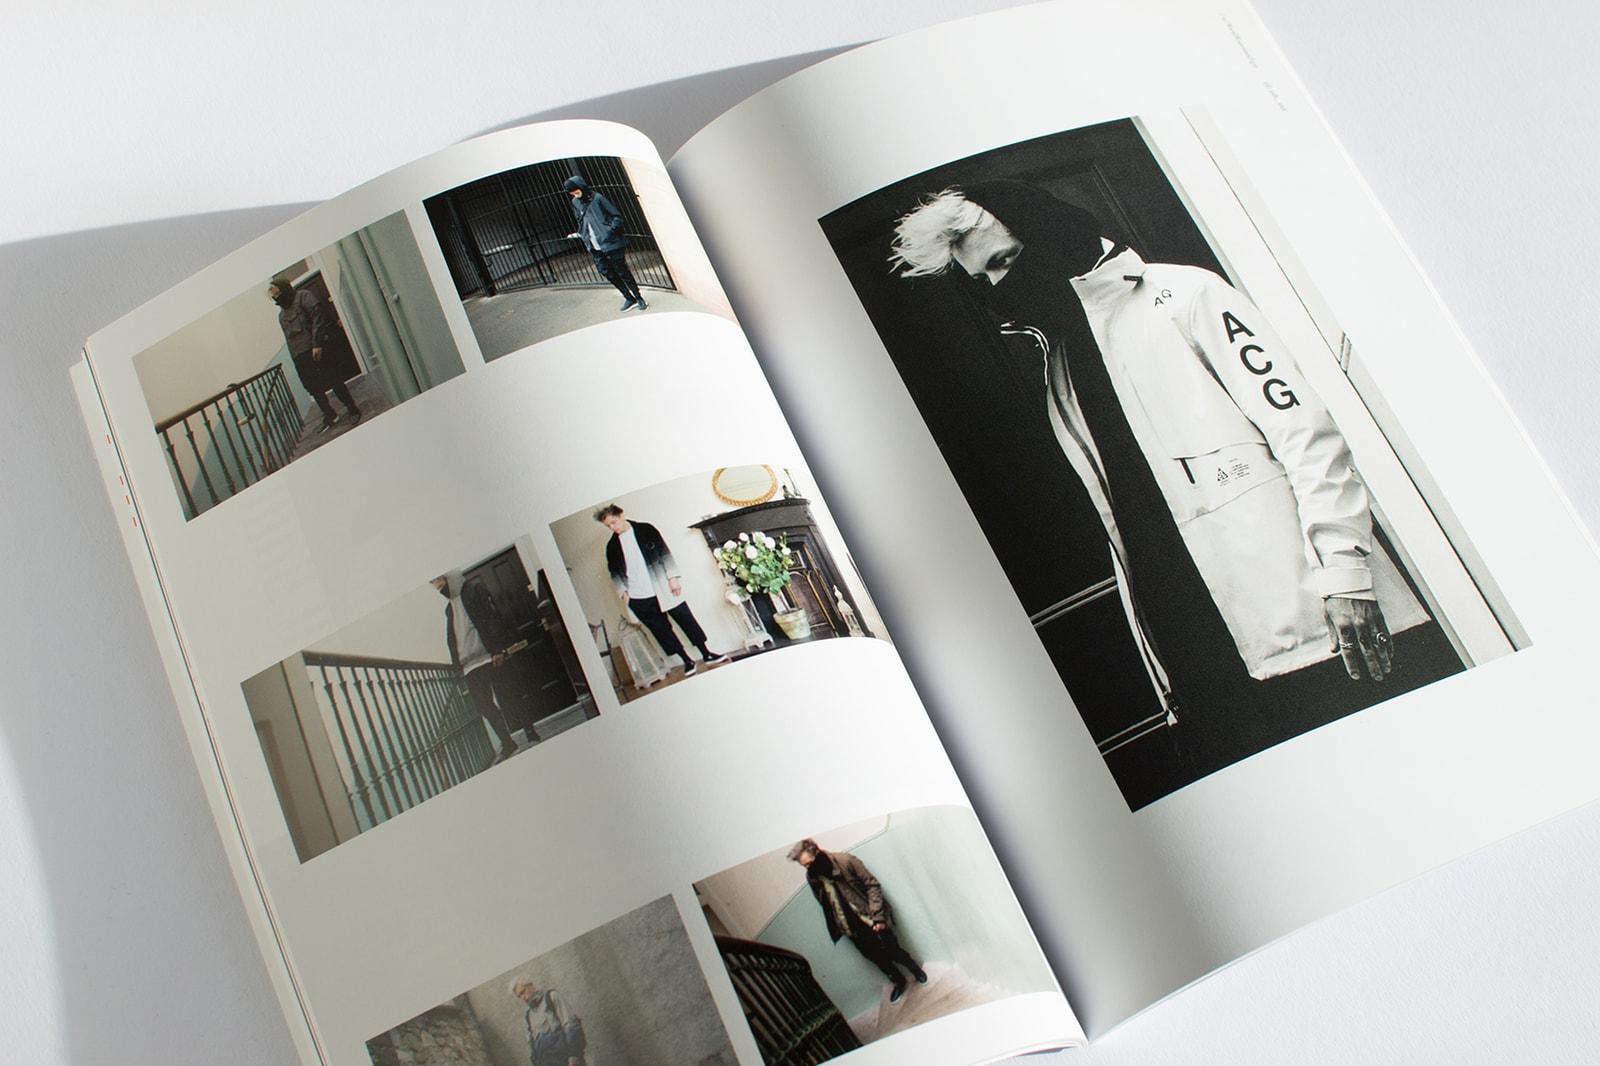 /r/streetwear Dan Hart-Davies Streetwear Supreme Gildan Print Magazine Publication